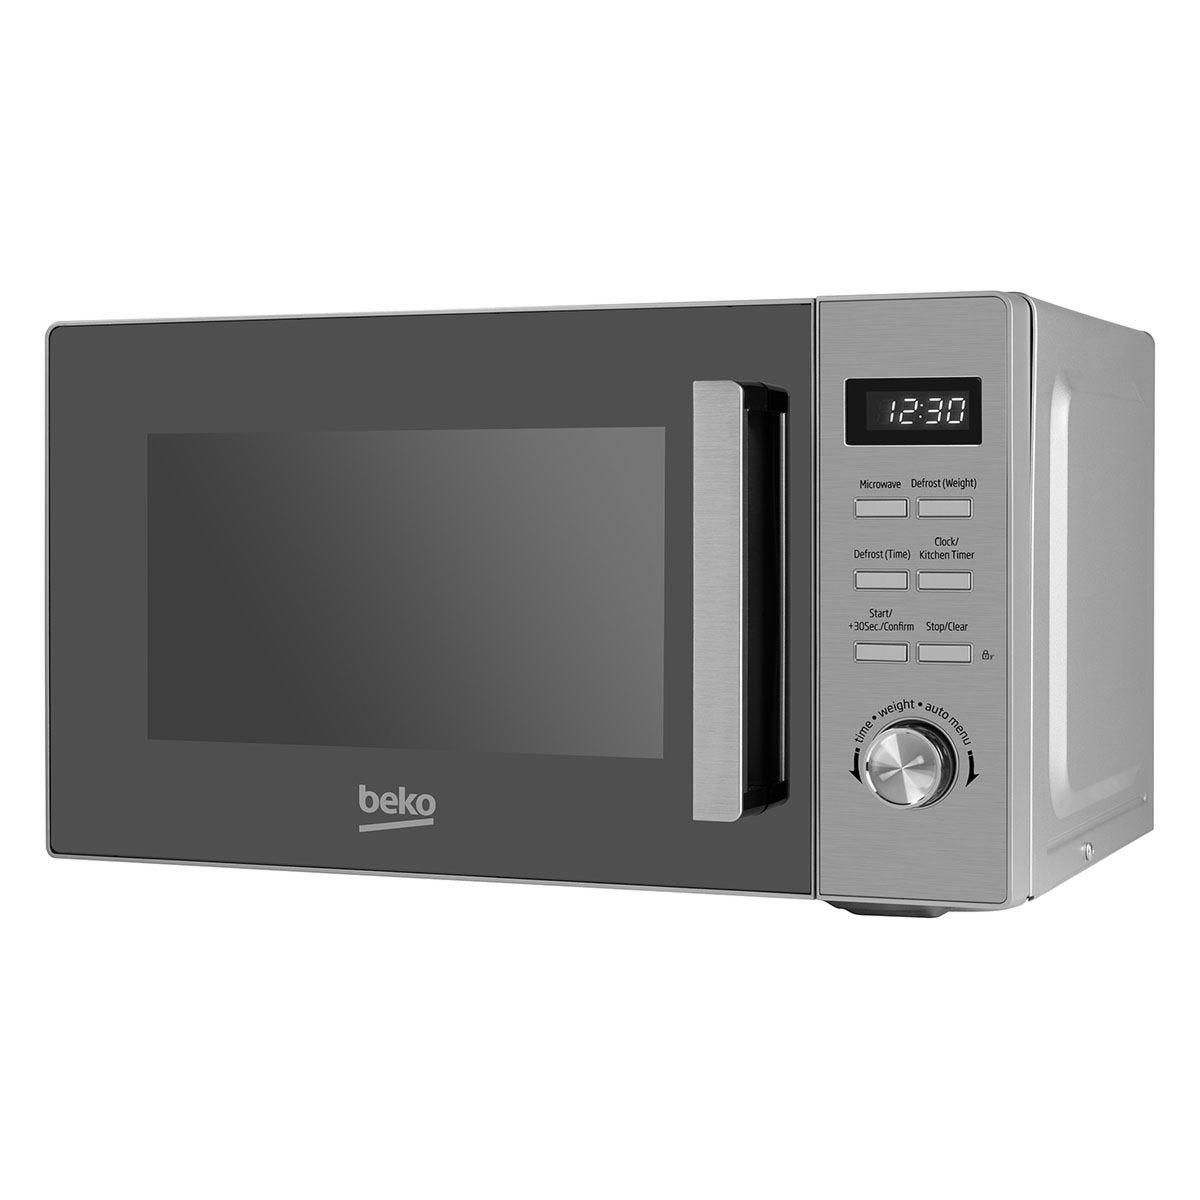 Beko MOF20110X 800W 20L Compact Solo Microwave - Silver